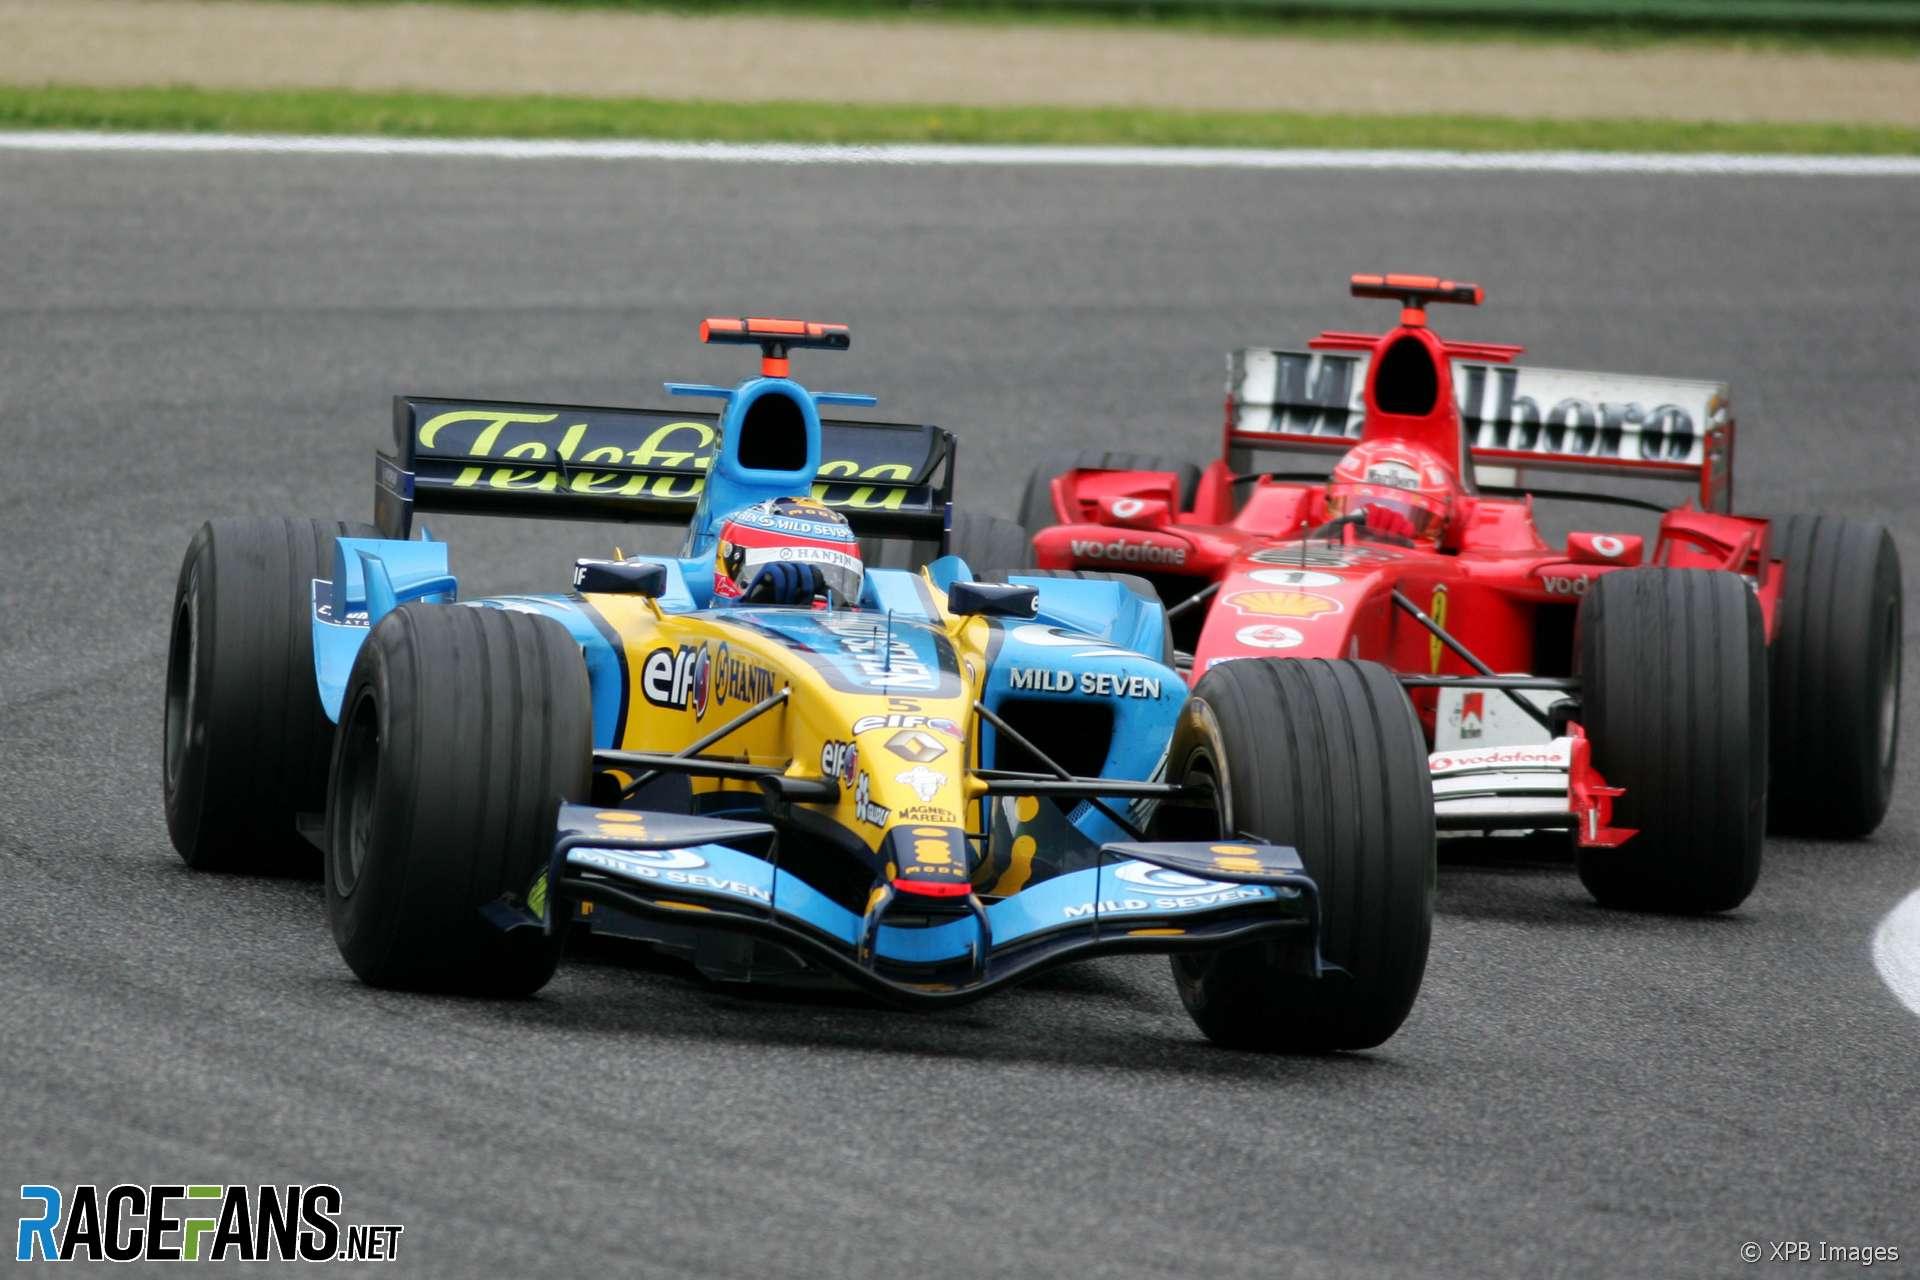 Fernando Alonso, Michael Schumacher, Imola, 2005